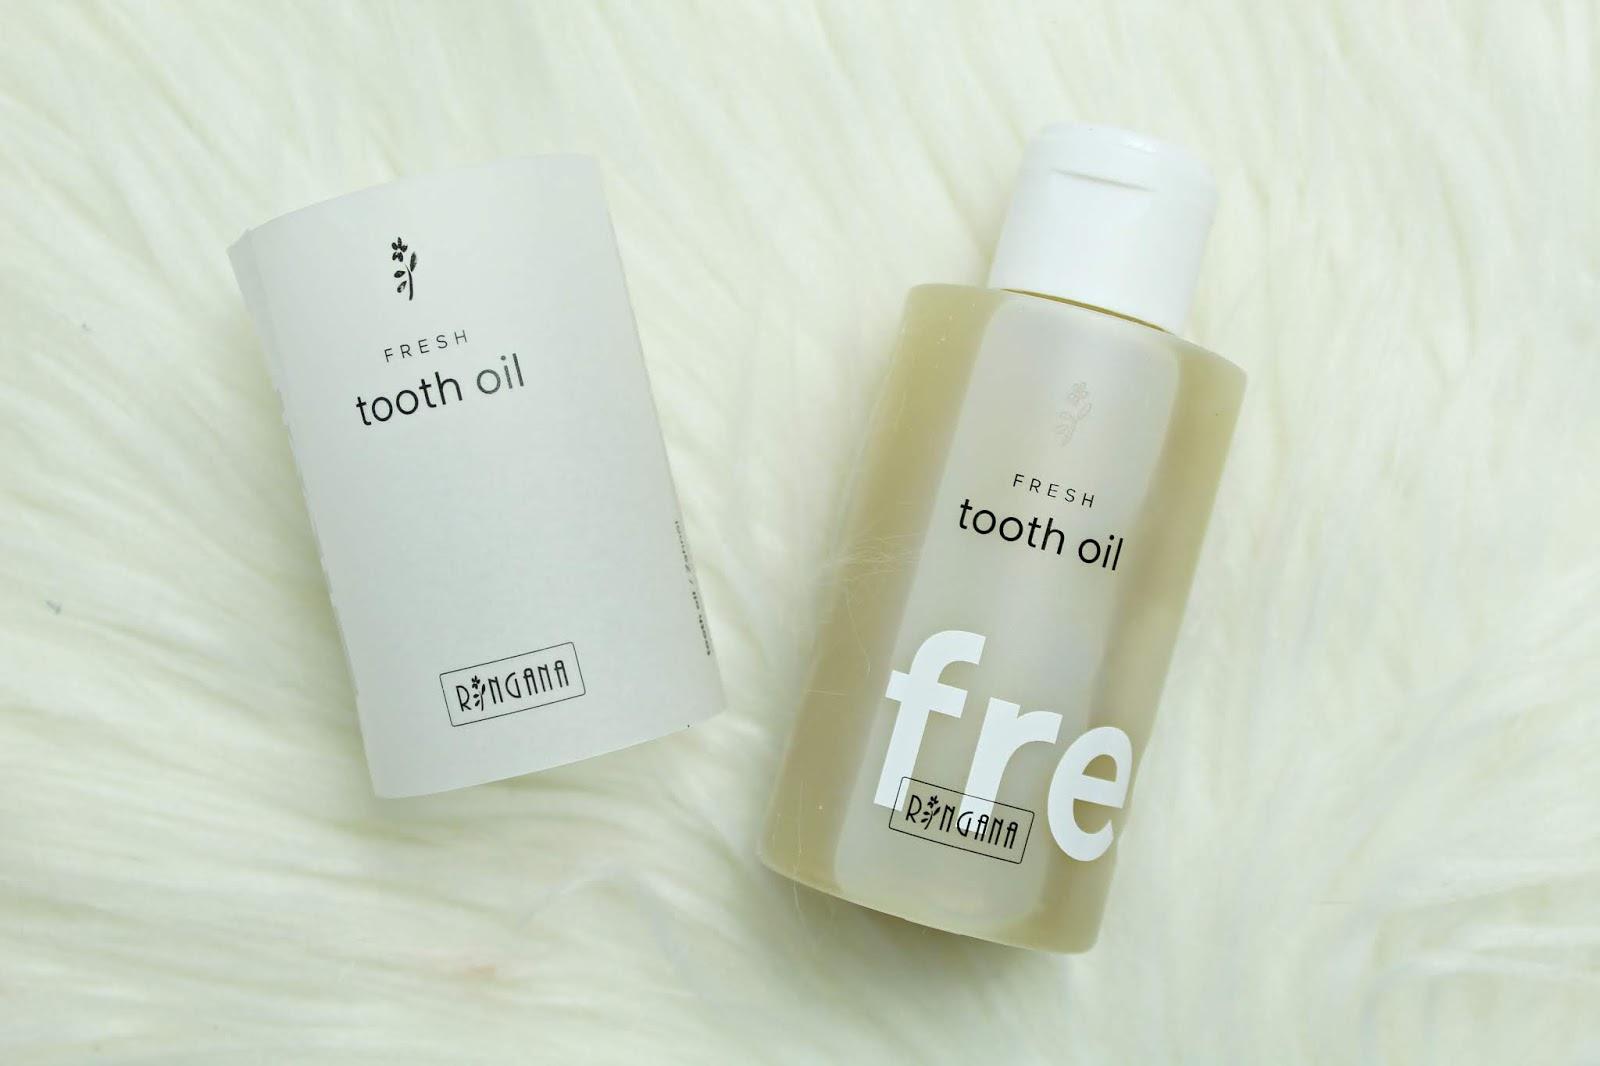 Ringana Fresh Tooth Oil